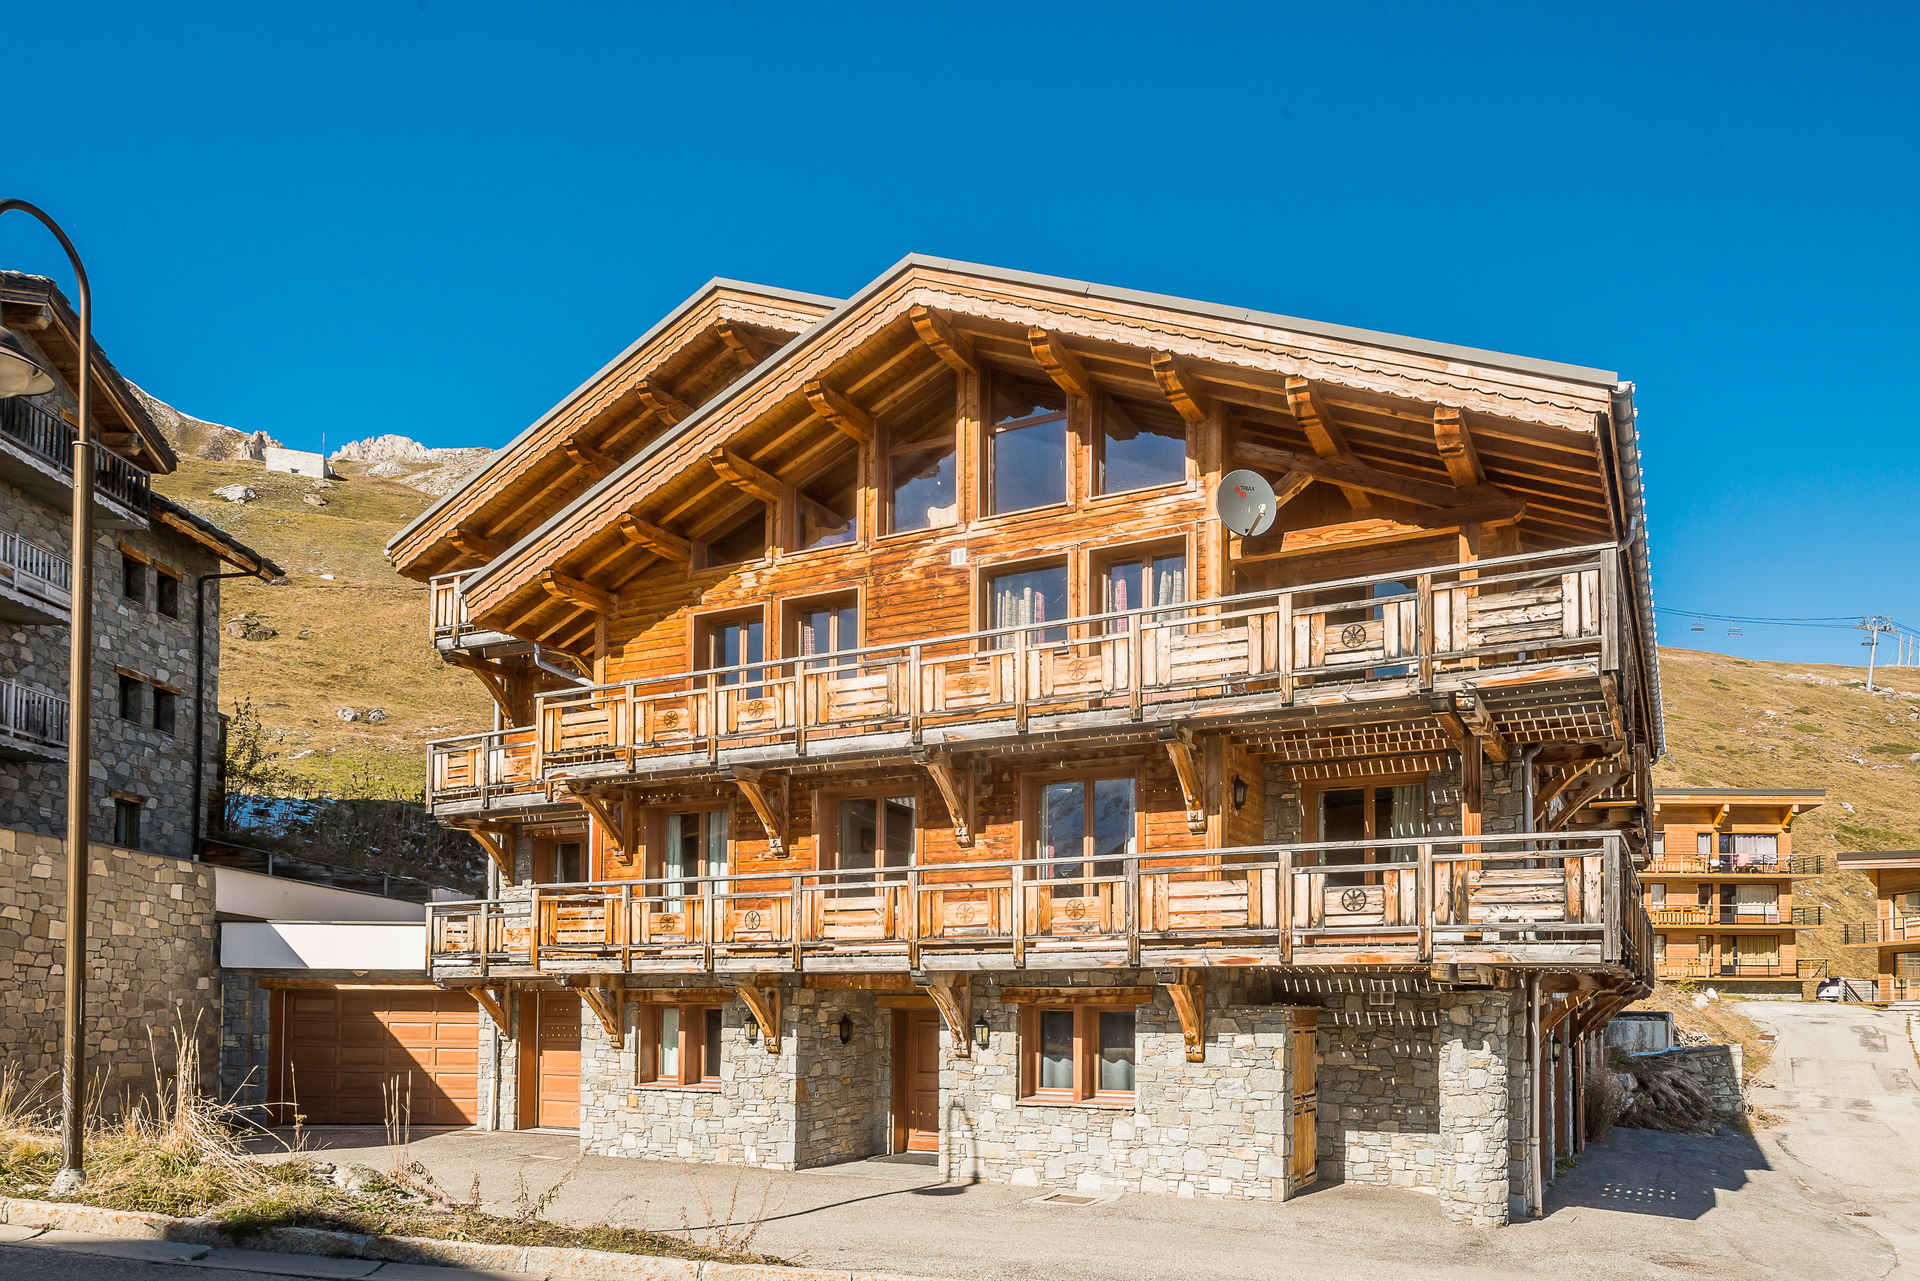 Apartments Annapurna Lodge